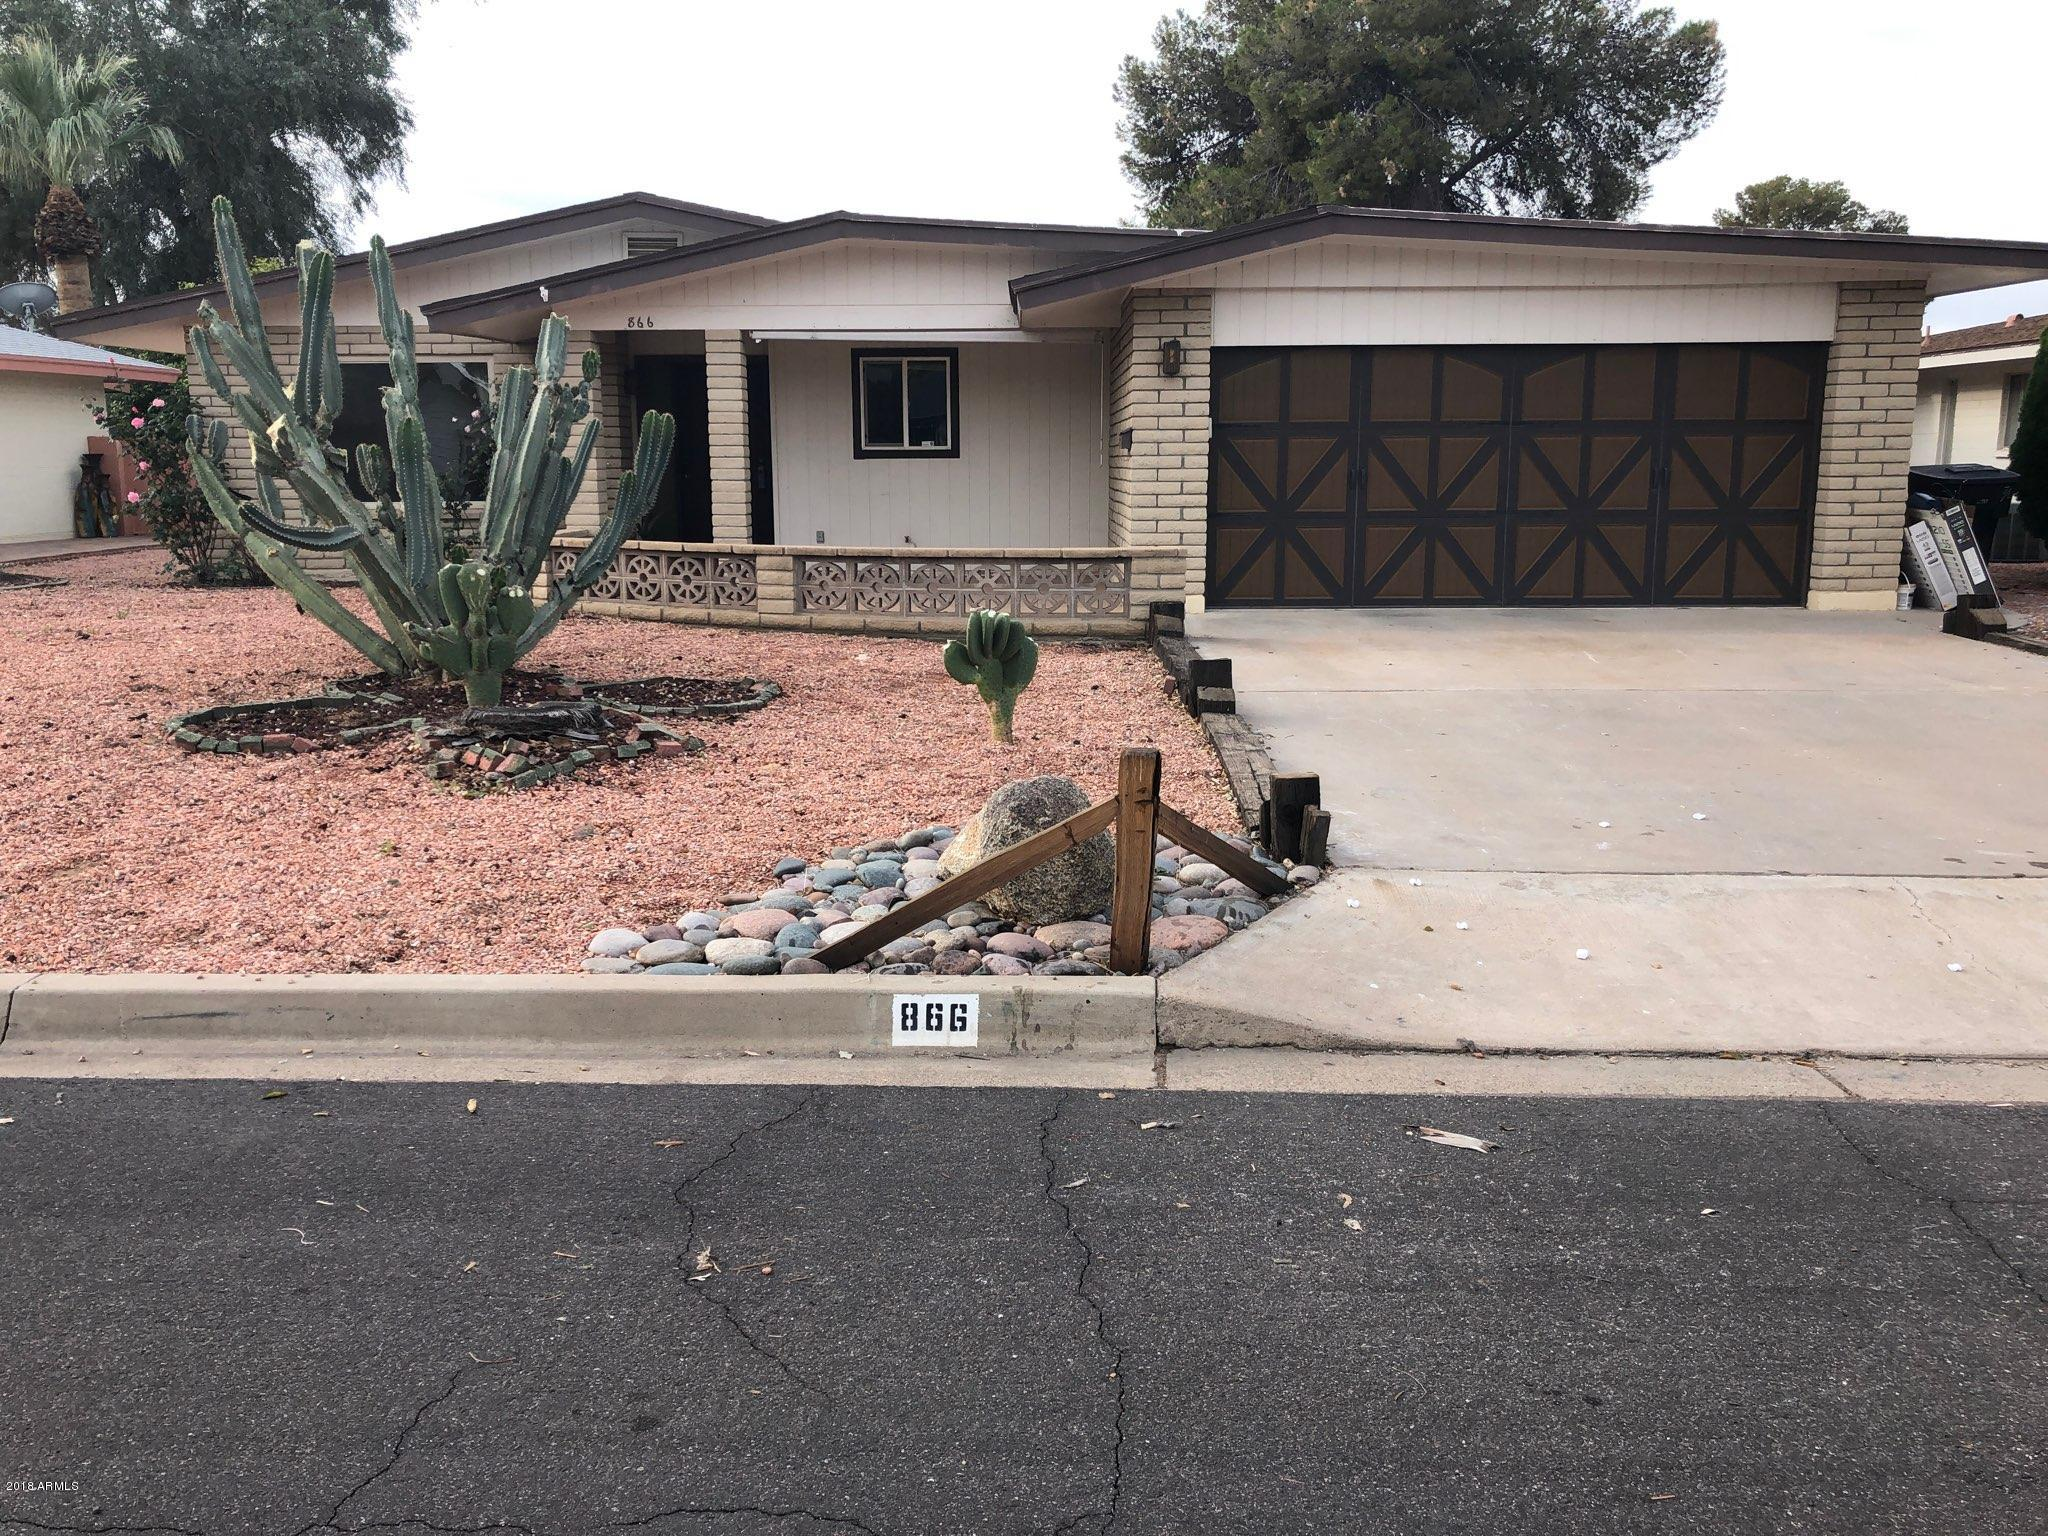 MLS 5855986 866 S REVOLTA Circle, Mesa, AZ 85208 Mesa AZ Apache Country Club